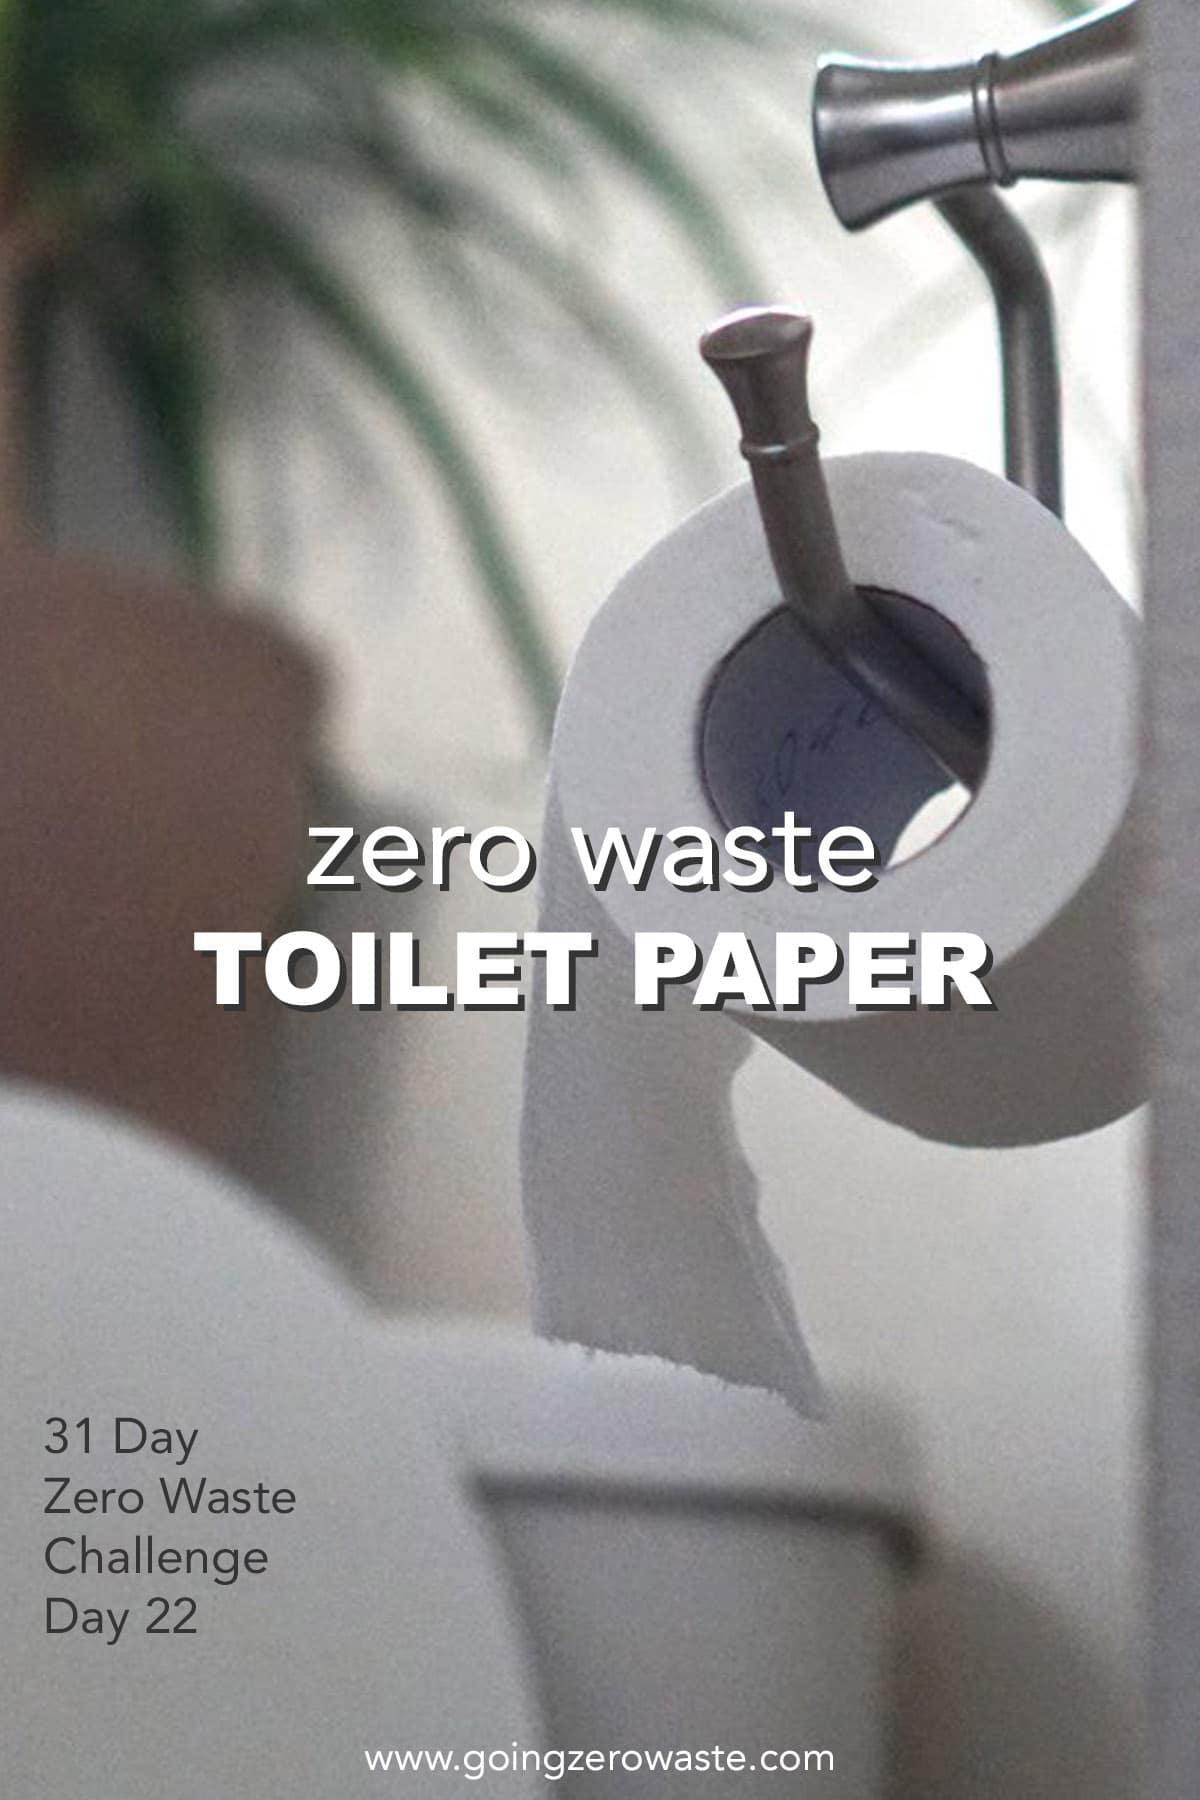 Zero Waste Toilet Paper - Day 22 of the Zero Waste Challenge